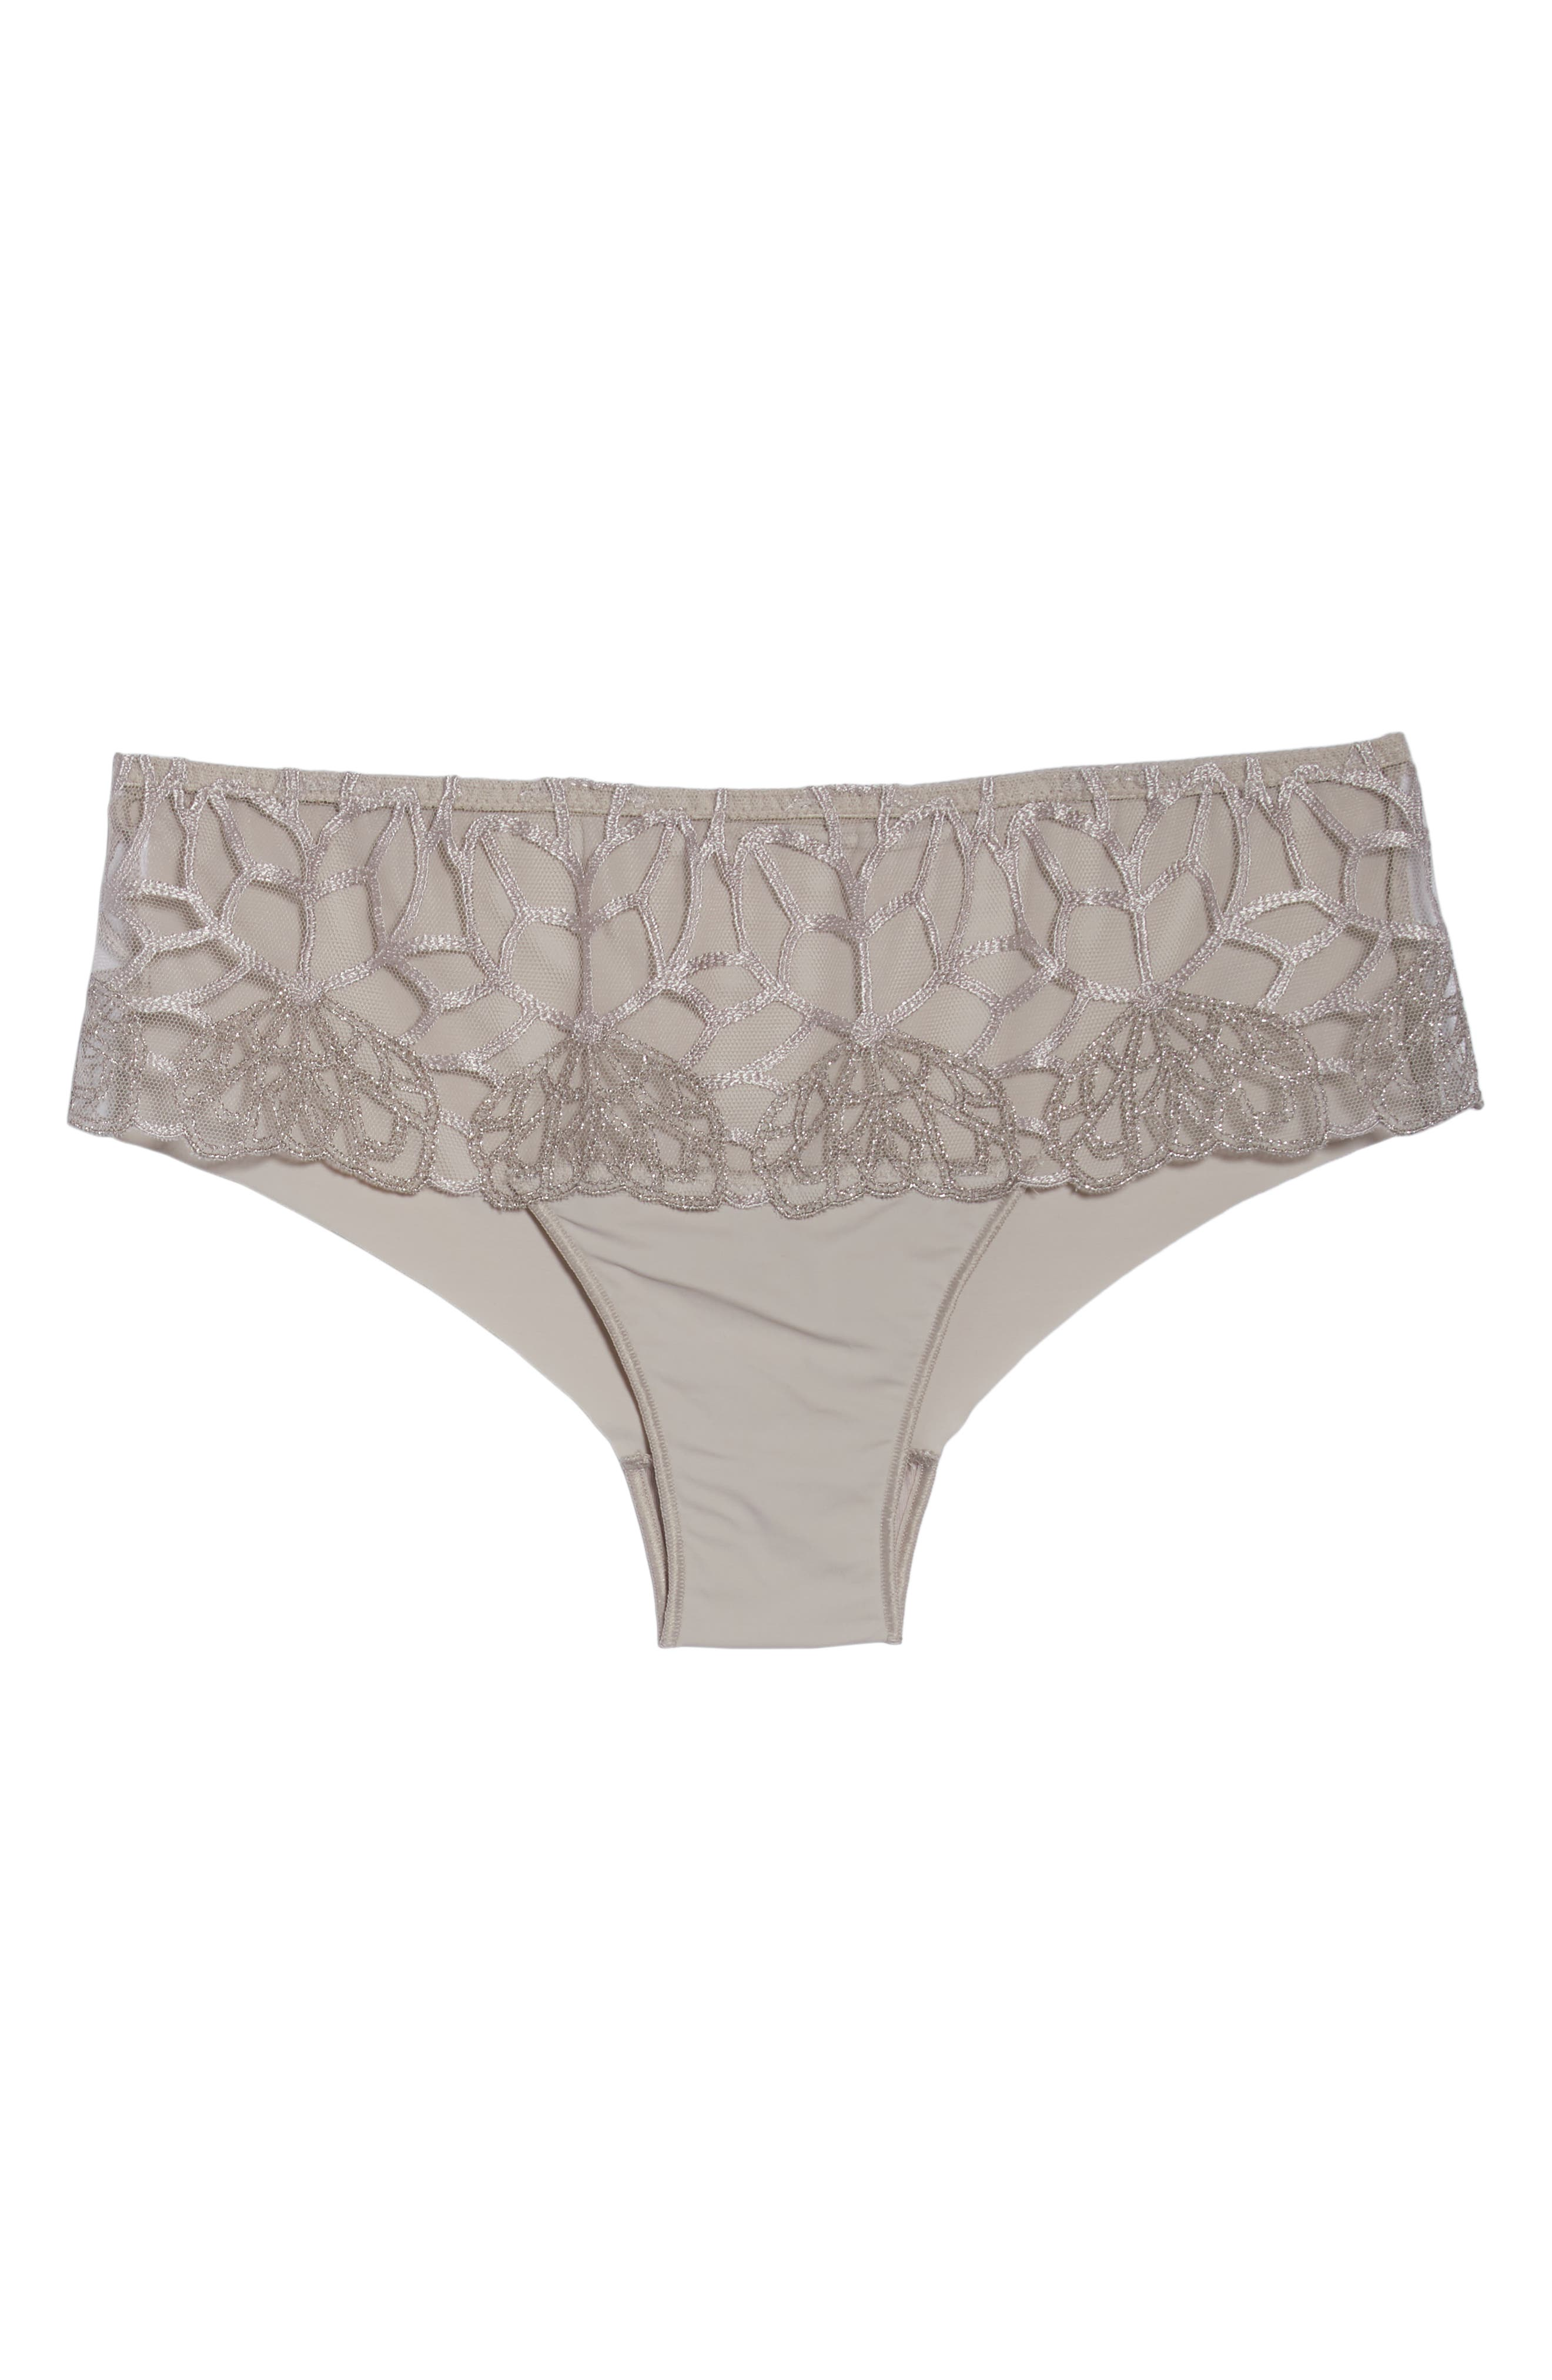 SIMONE PERELE,                             Java Hipster Panties,                             Alternate thumbnail 6, color,                             LINEN